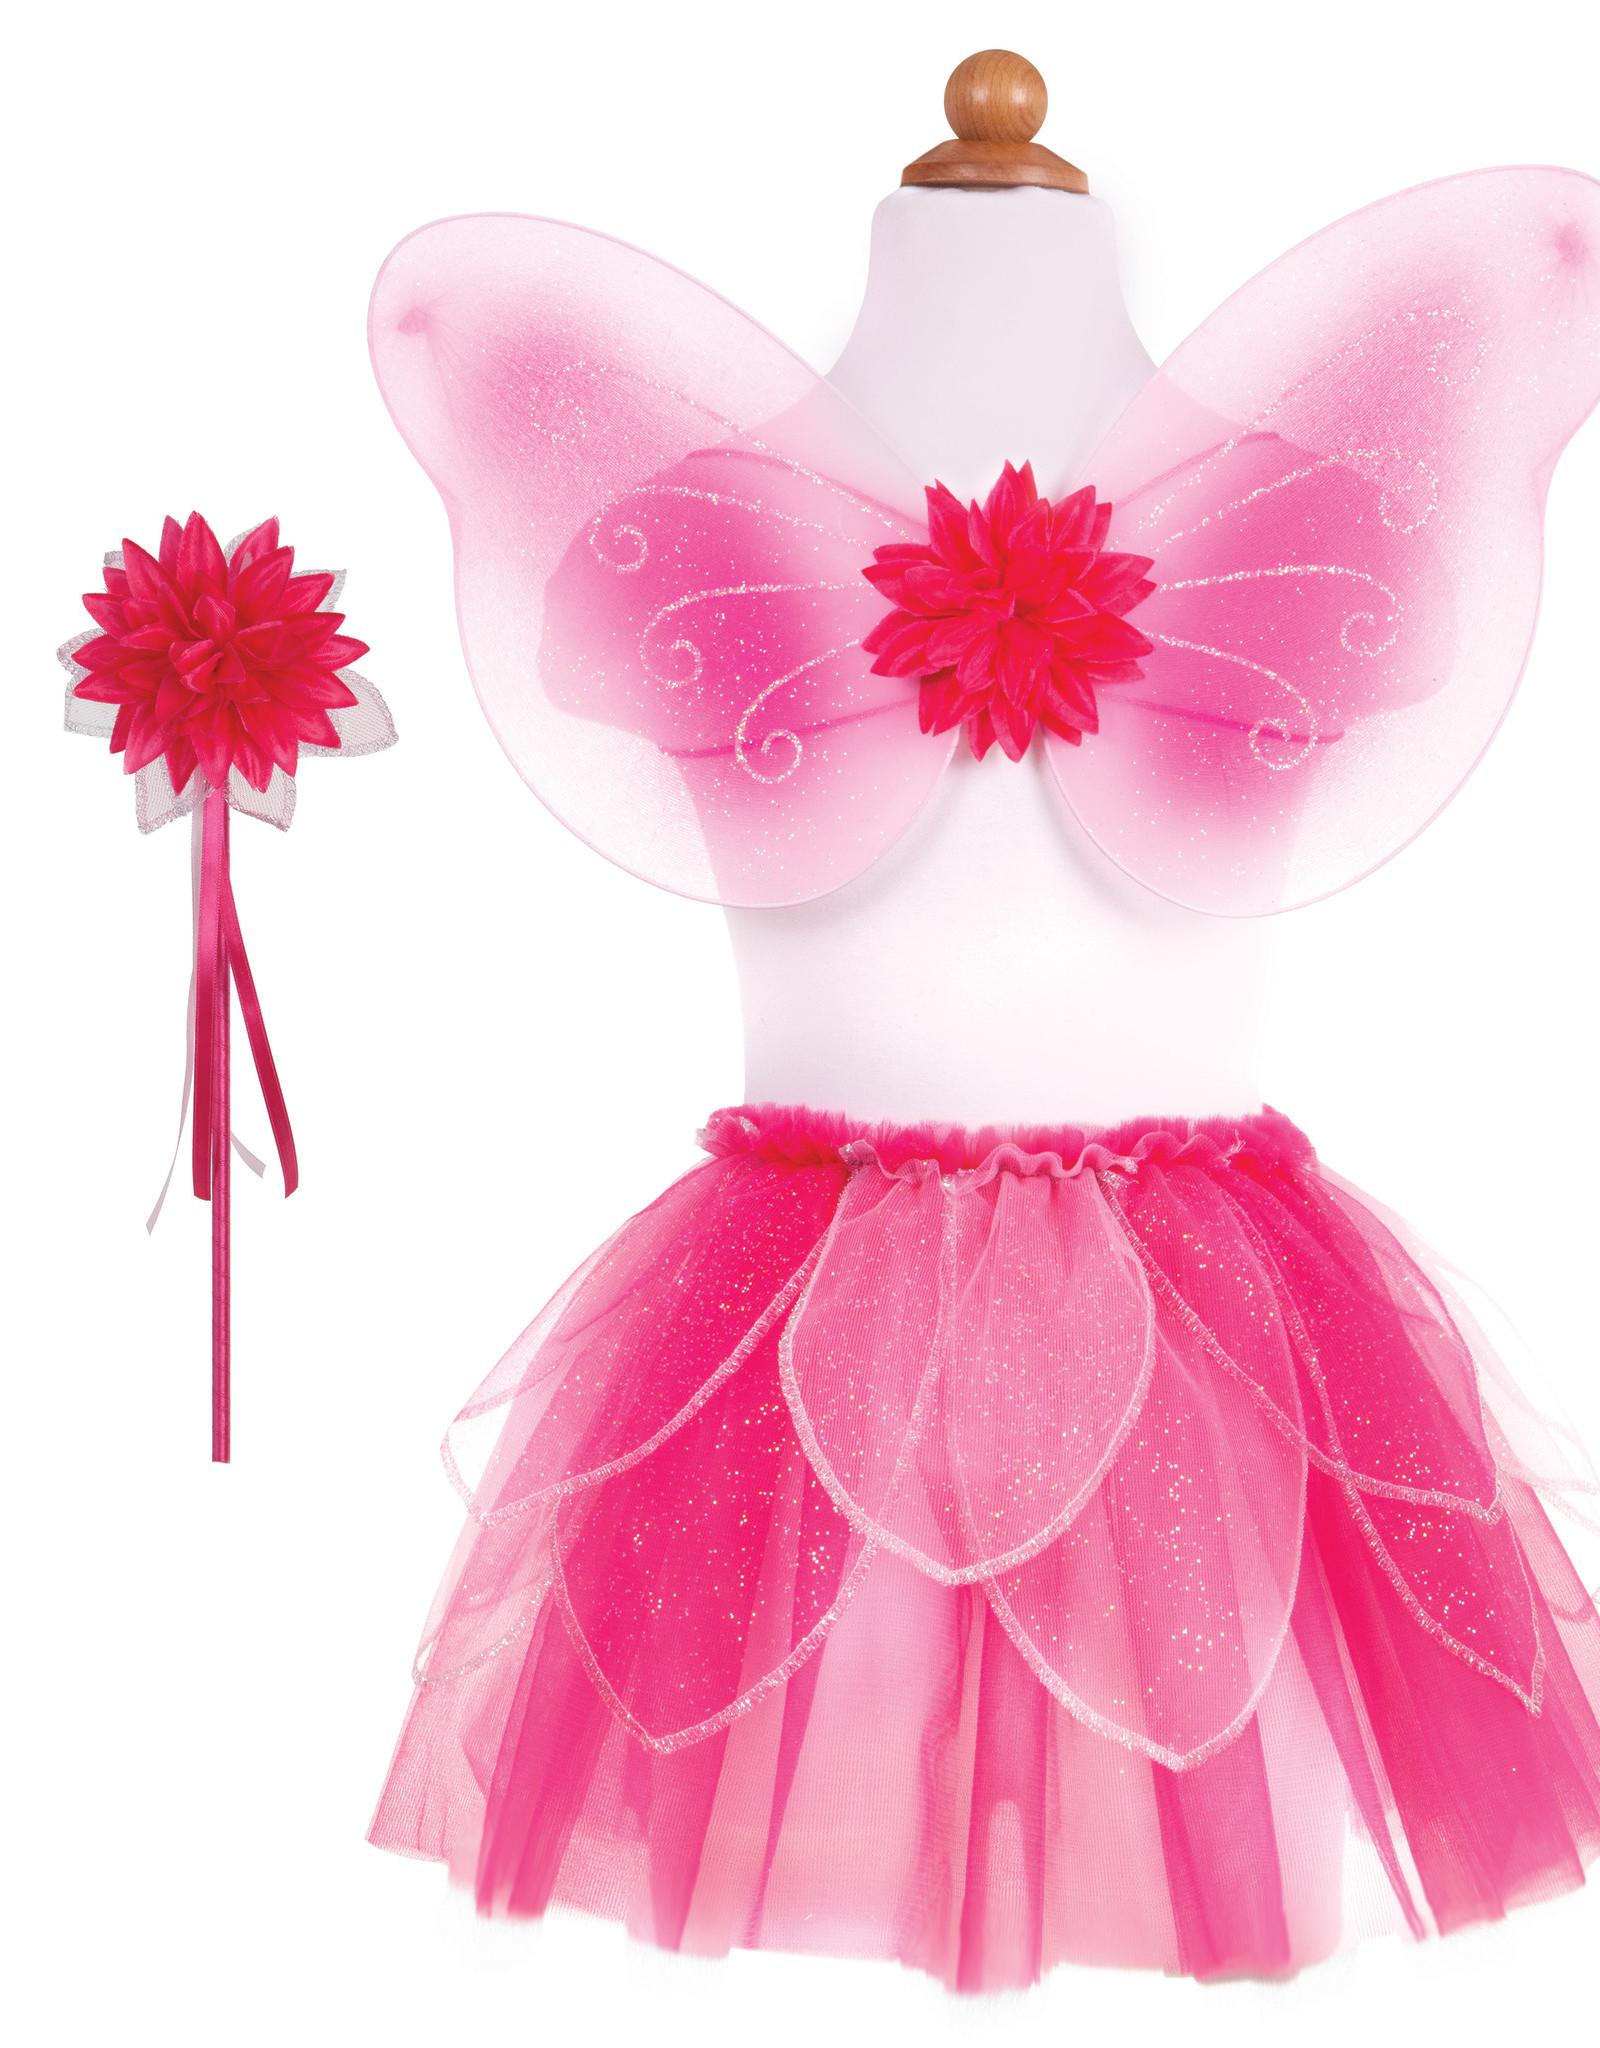 Great Pretenders Fancy Flutter Skirt with Wings & Wand - Pink